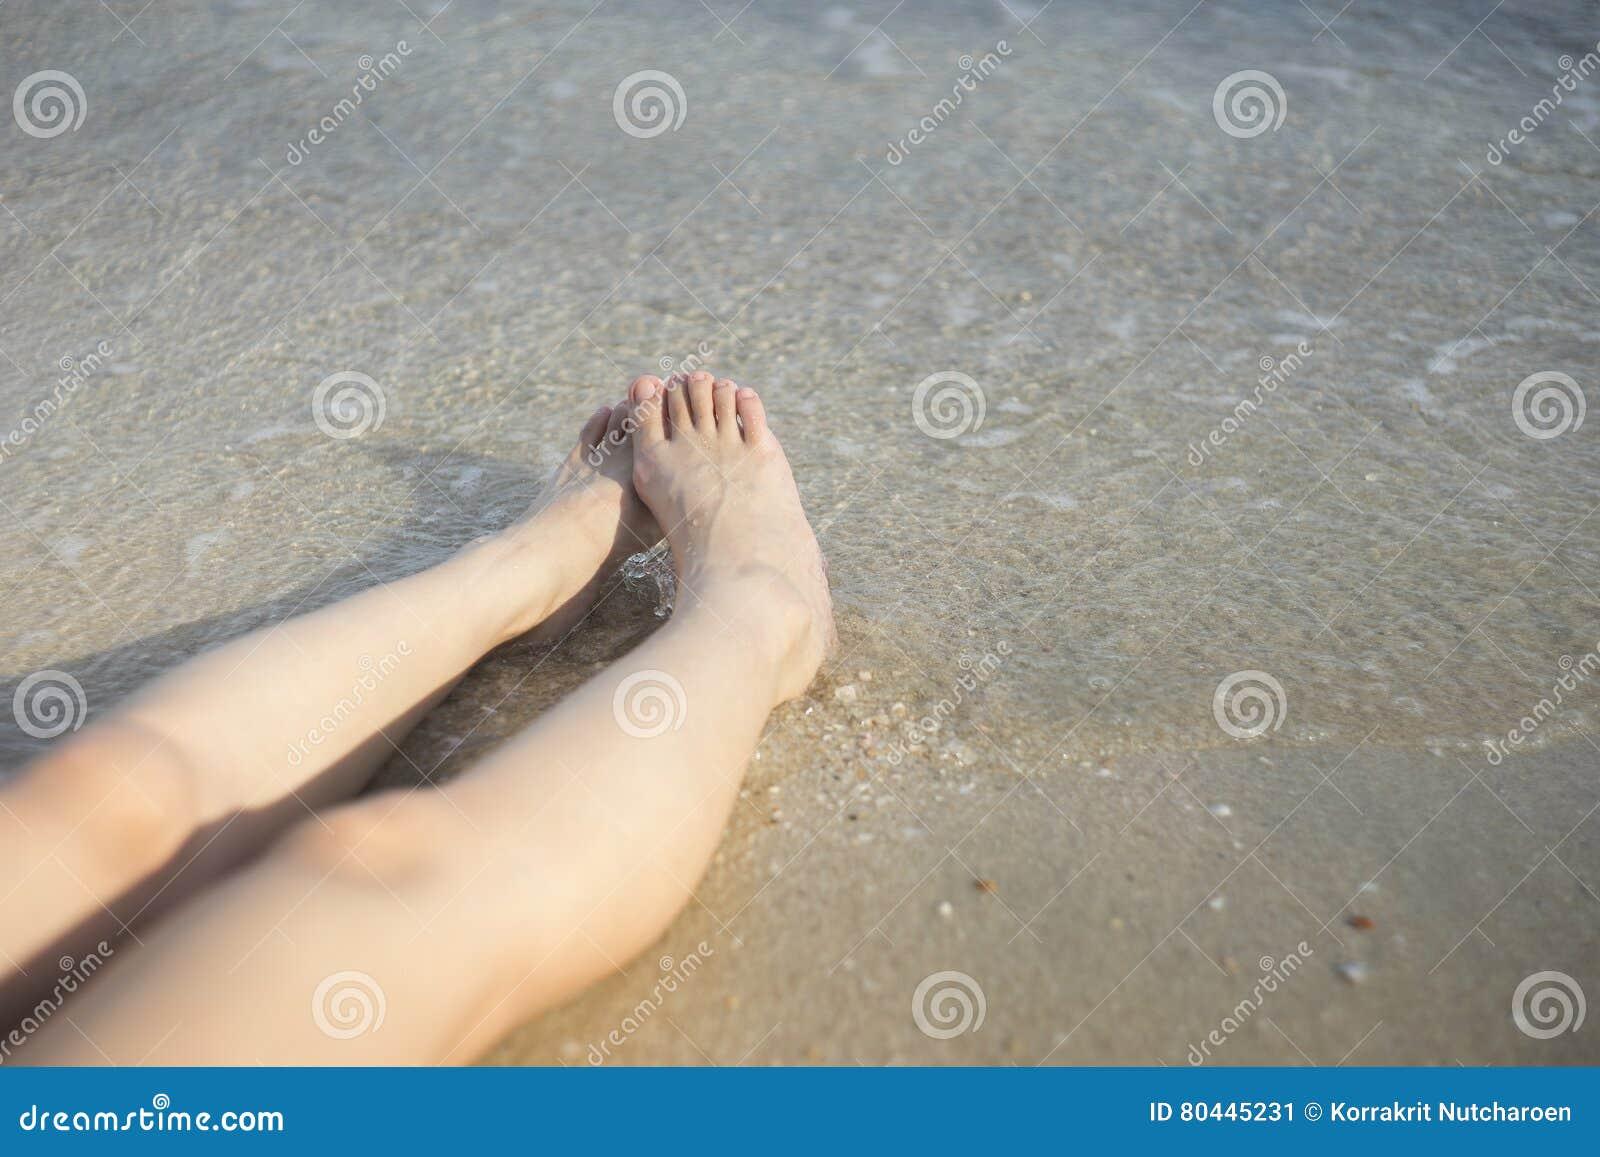 f90a441aa4 Πόδια γυναικών που βάζουν στην παραλία άμμου Πόδια μιας νέας γυναίκας σε  μια παραλία ηλιοθεραπεία